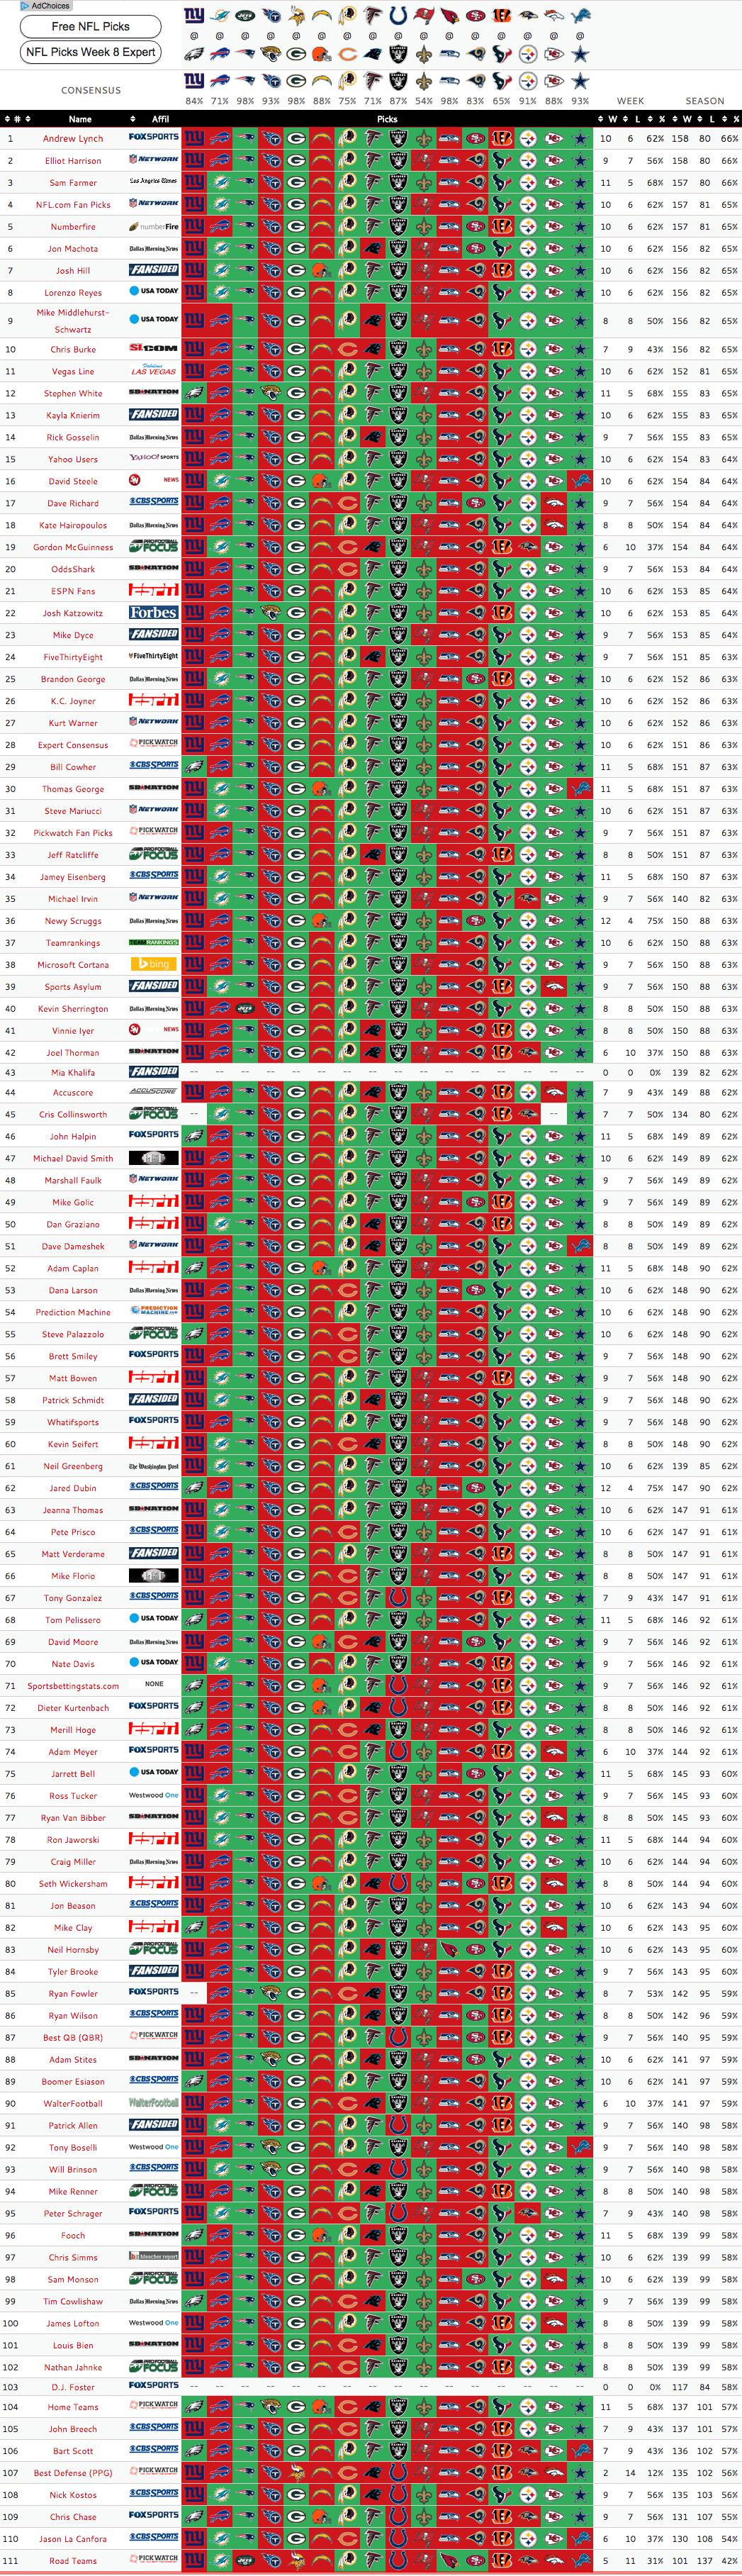 Expert NFL Picks and Predictions: Week 16 | BigOnSports